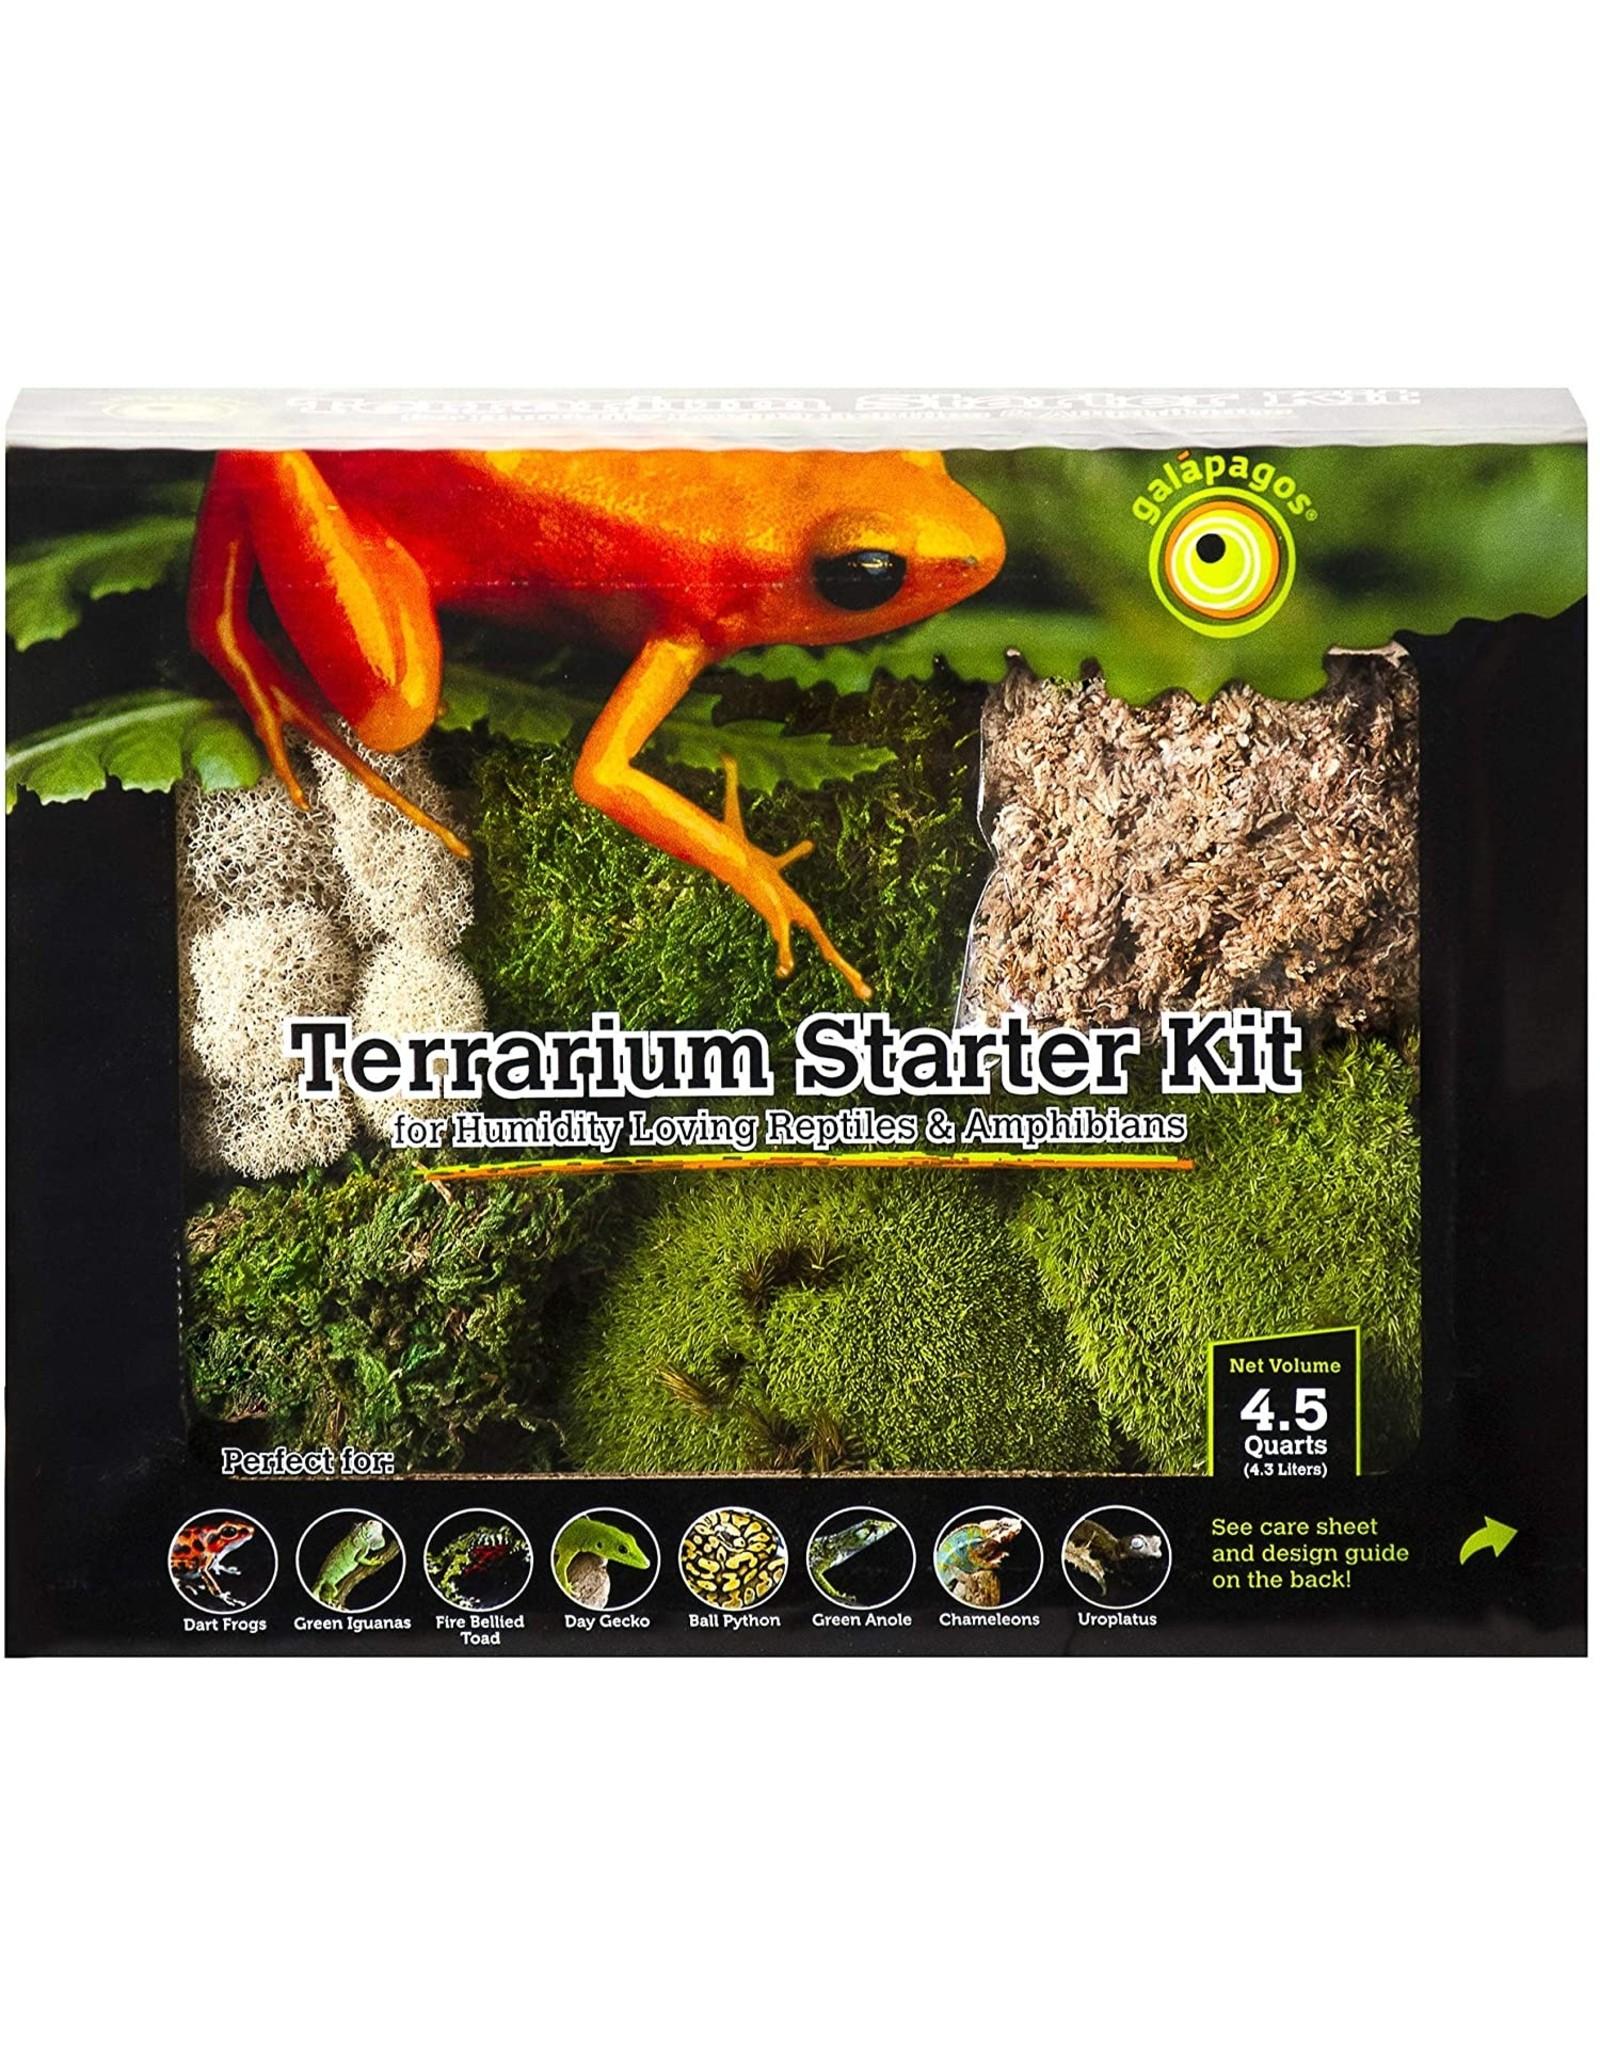 Galapagos GALAPAGOS Terrarium Starter Kit Humid Environment 4.5qt